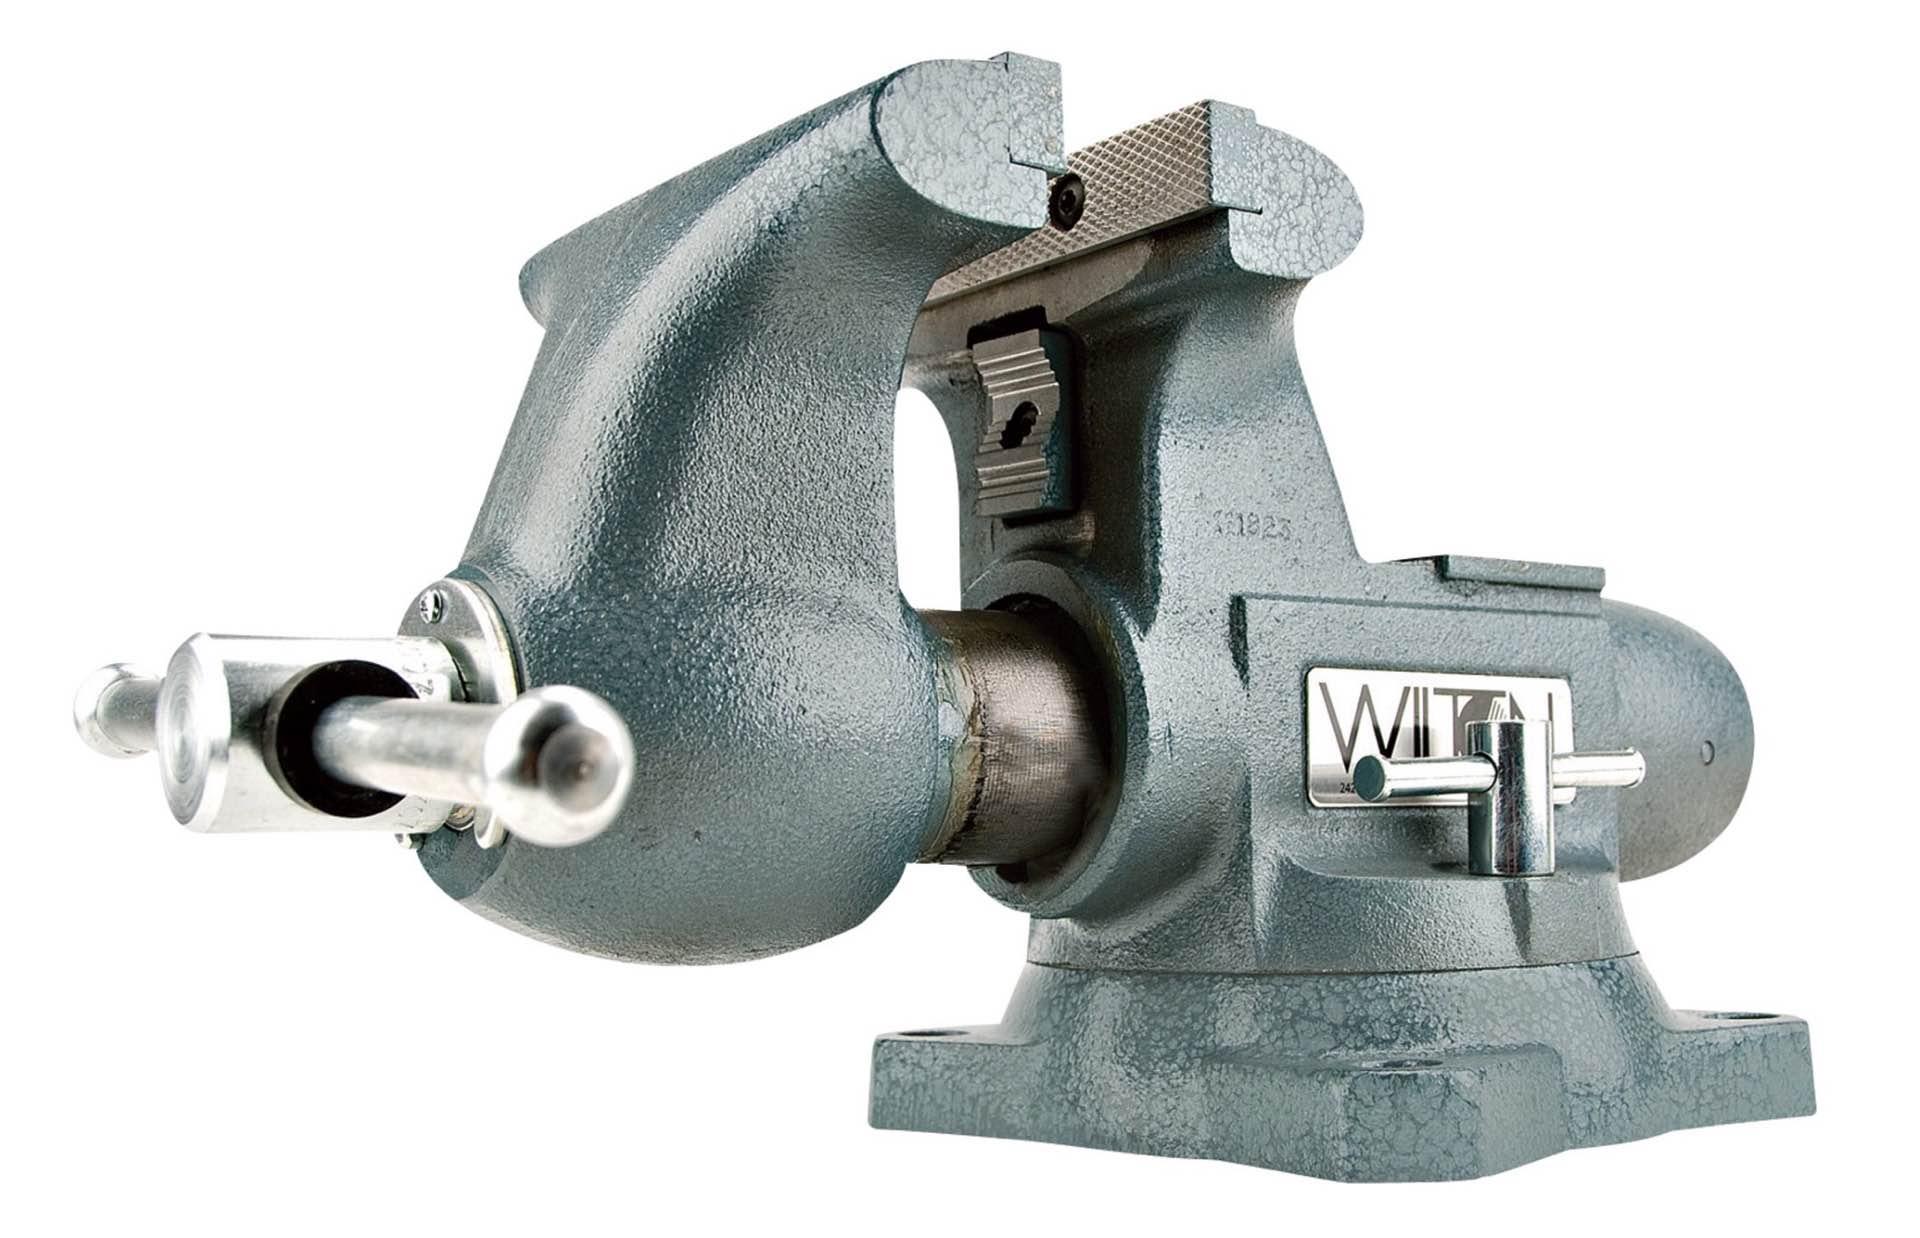 wilton-1765-tradesman-bench-vise